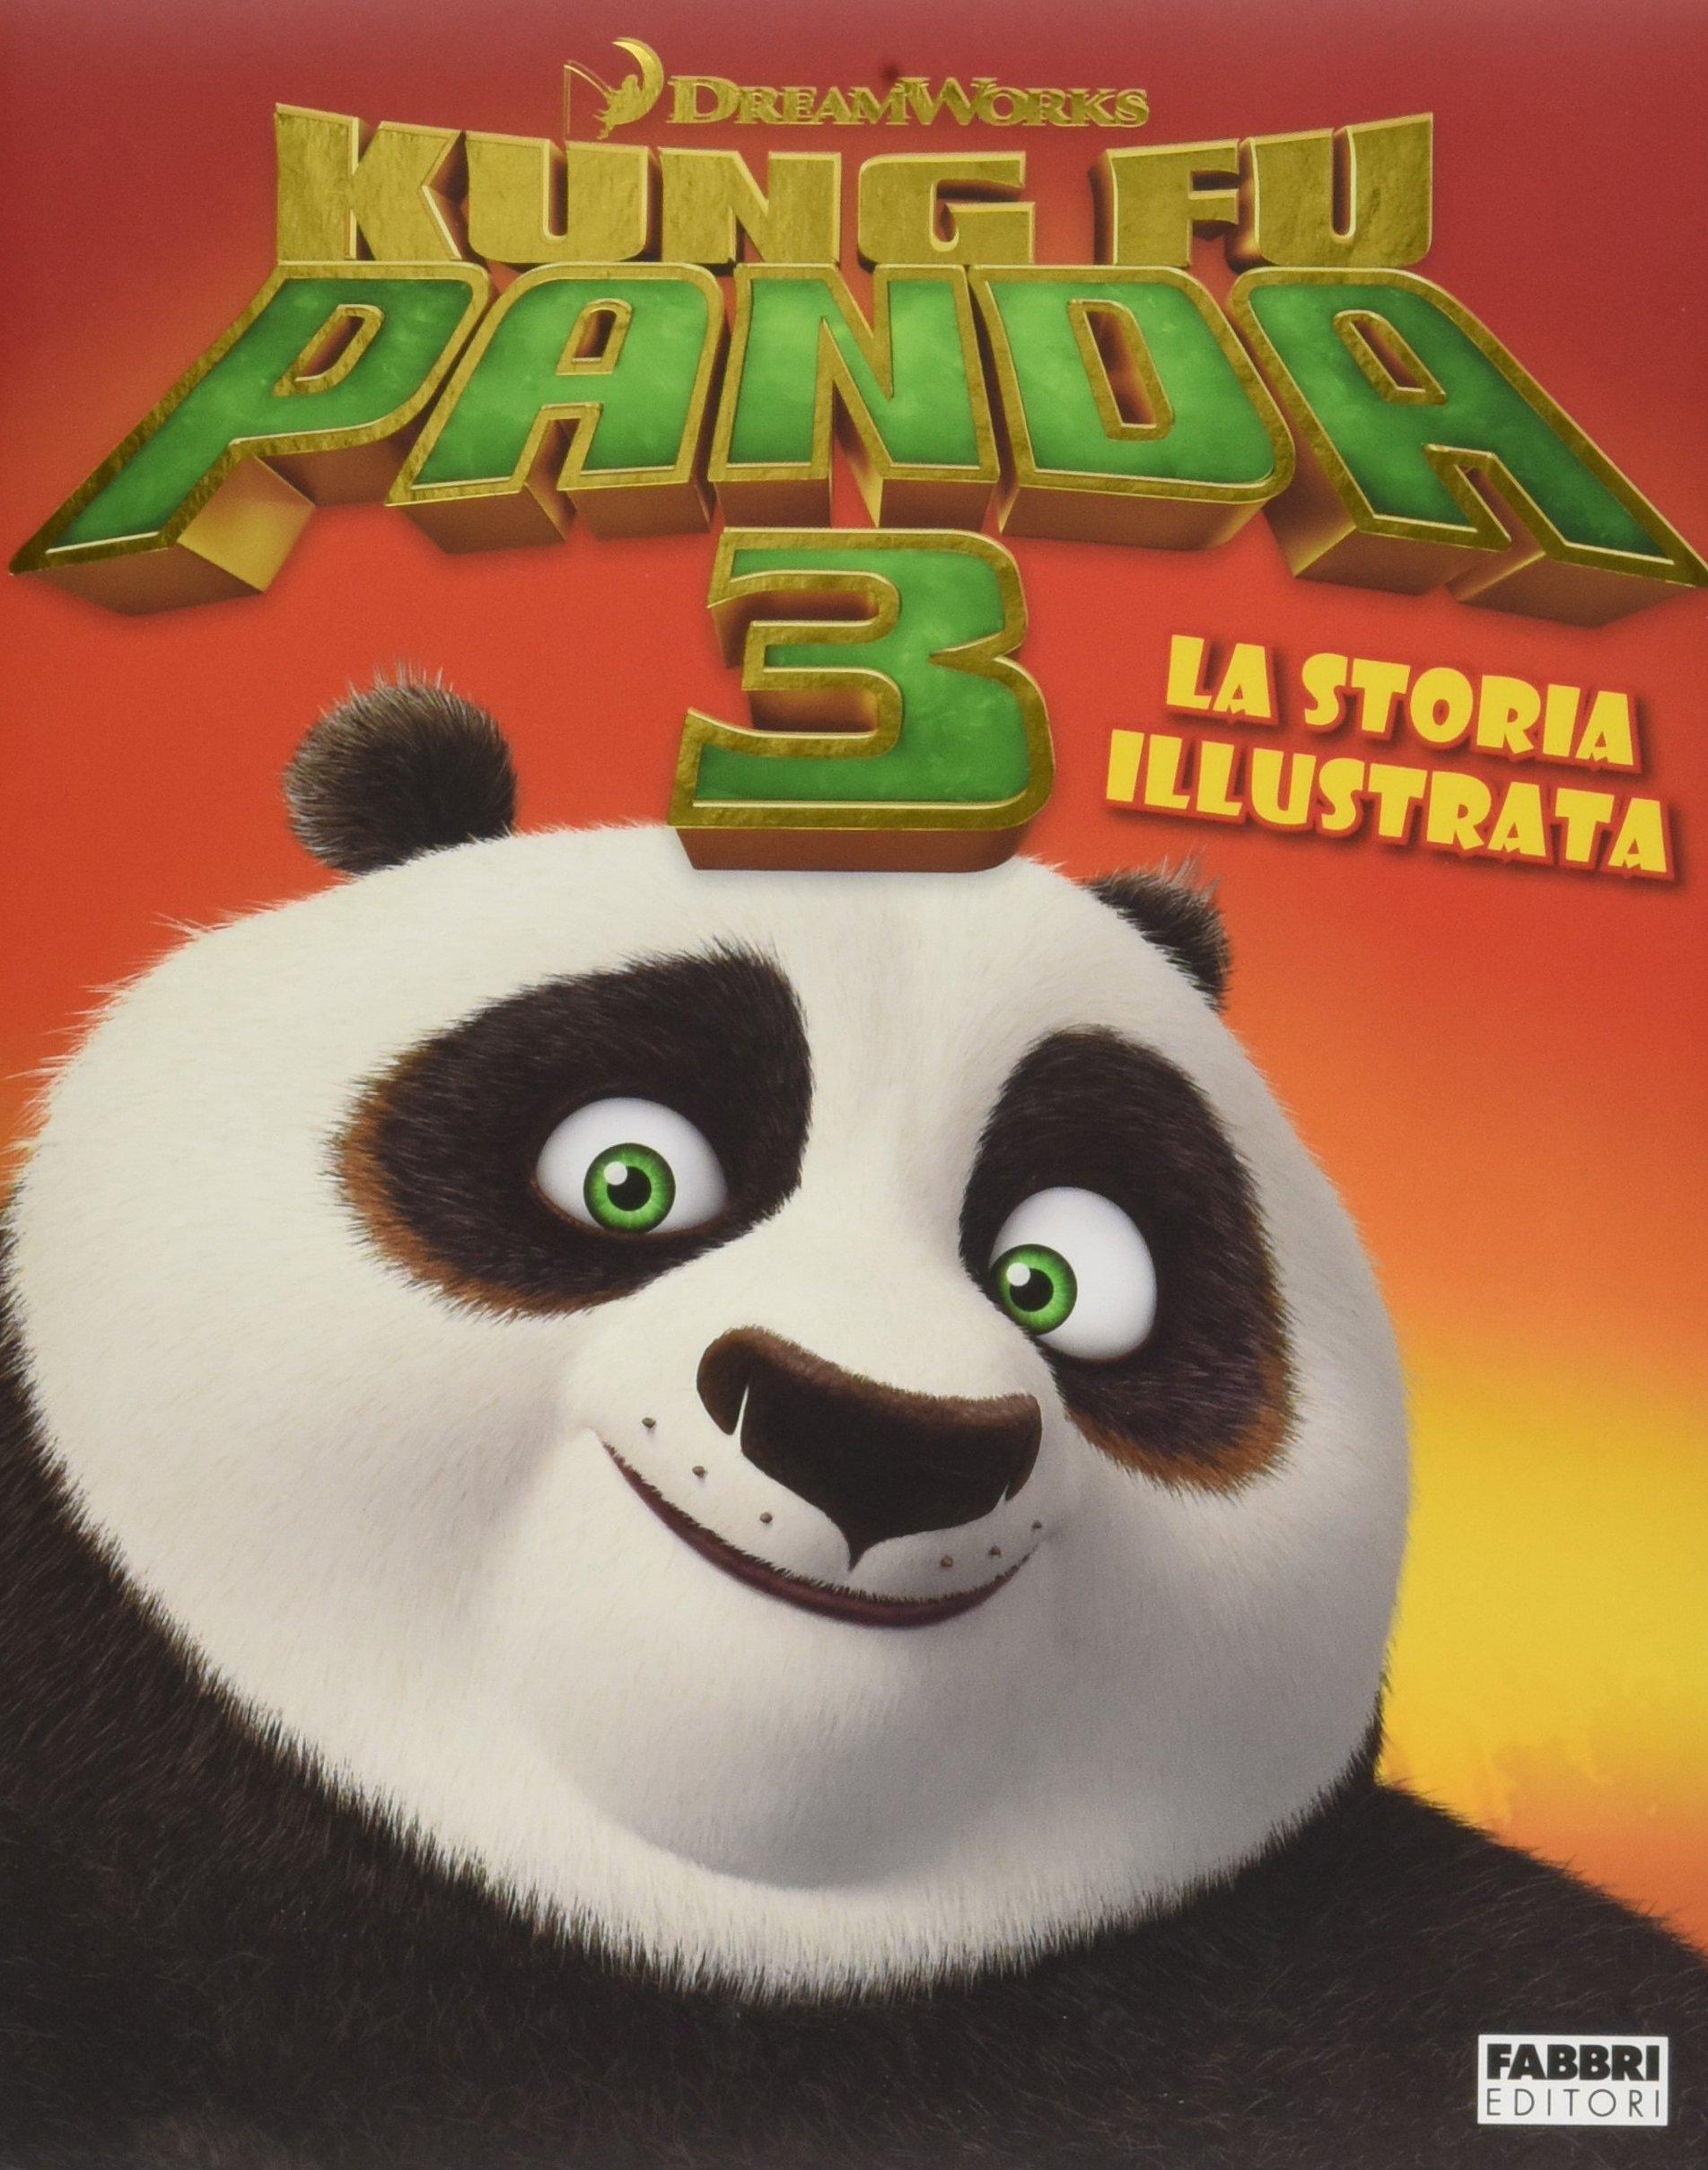 Amazon.it: kung fu panda 3. la storia illustrata dreamworks libri